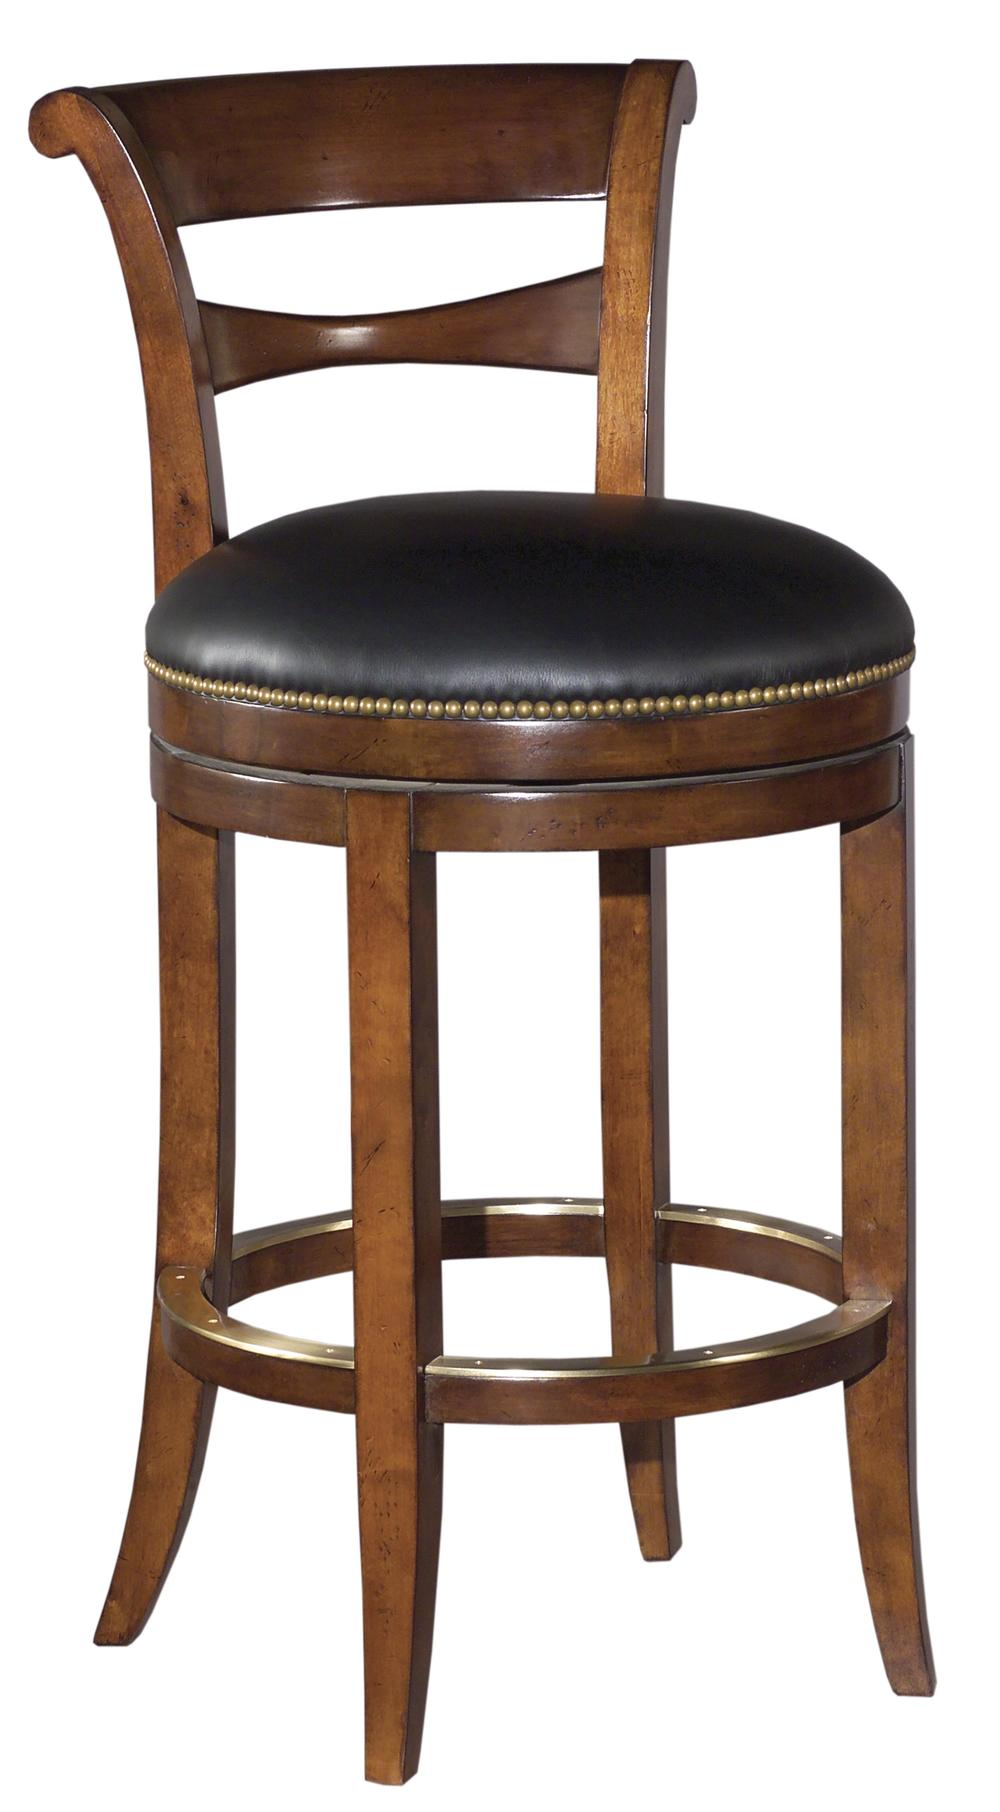 Woodbridge Furniture Company - Armless Bar Stool